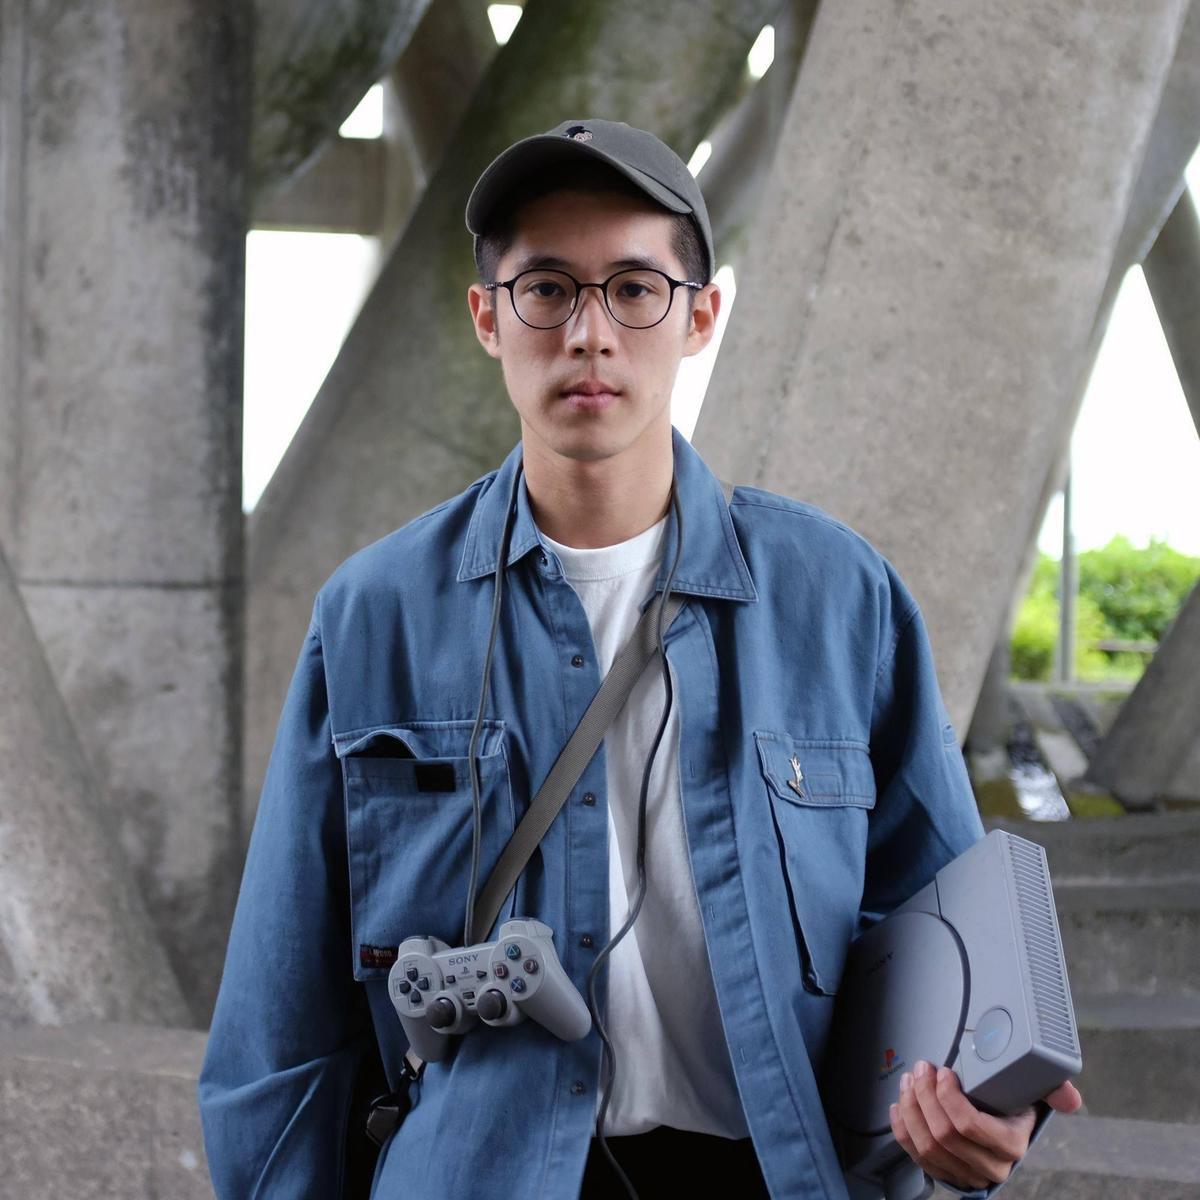 MV導演陳則安被爆料是霸凌魔頭。(翻攝陳則安臉書)